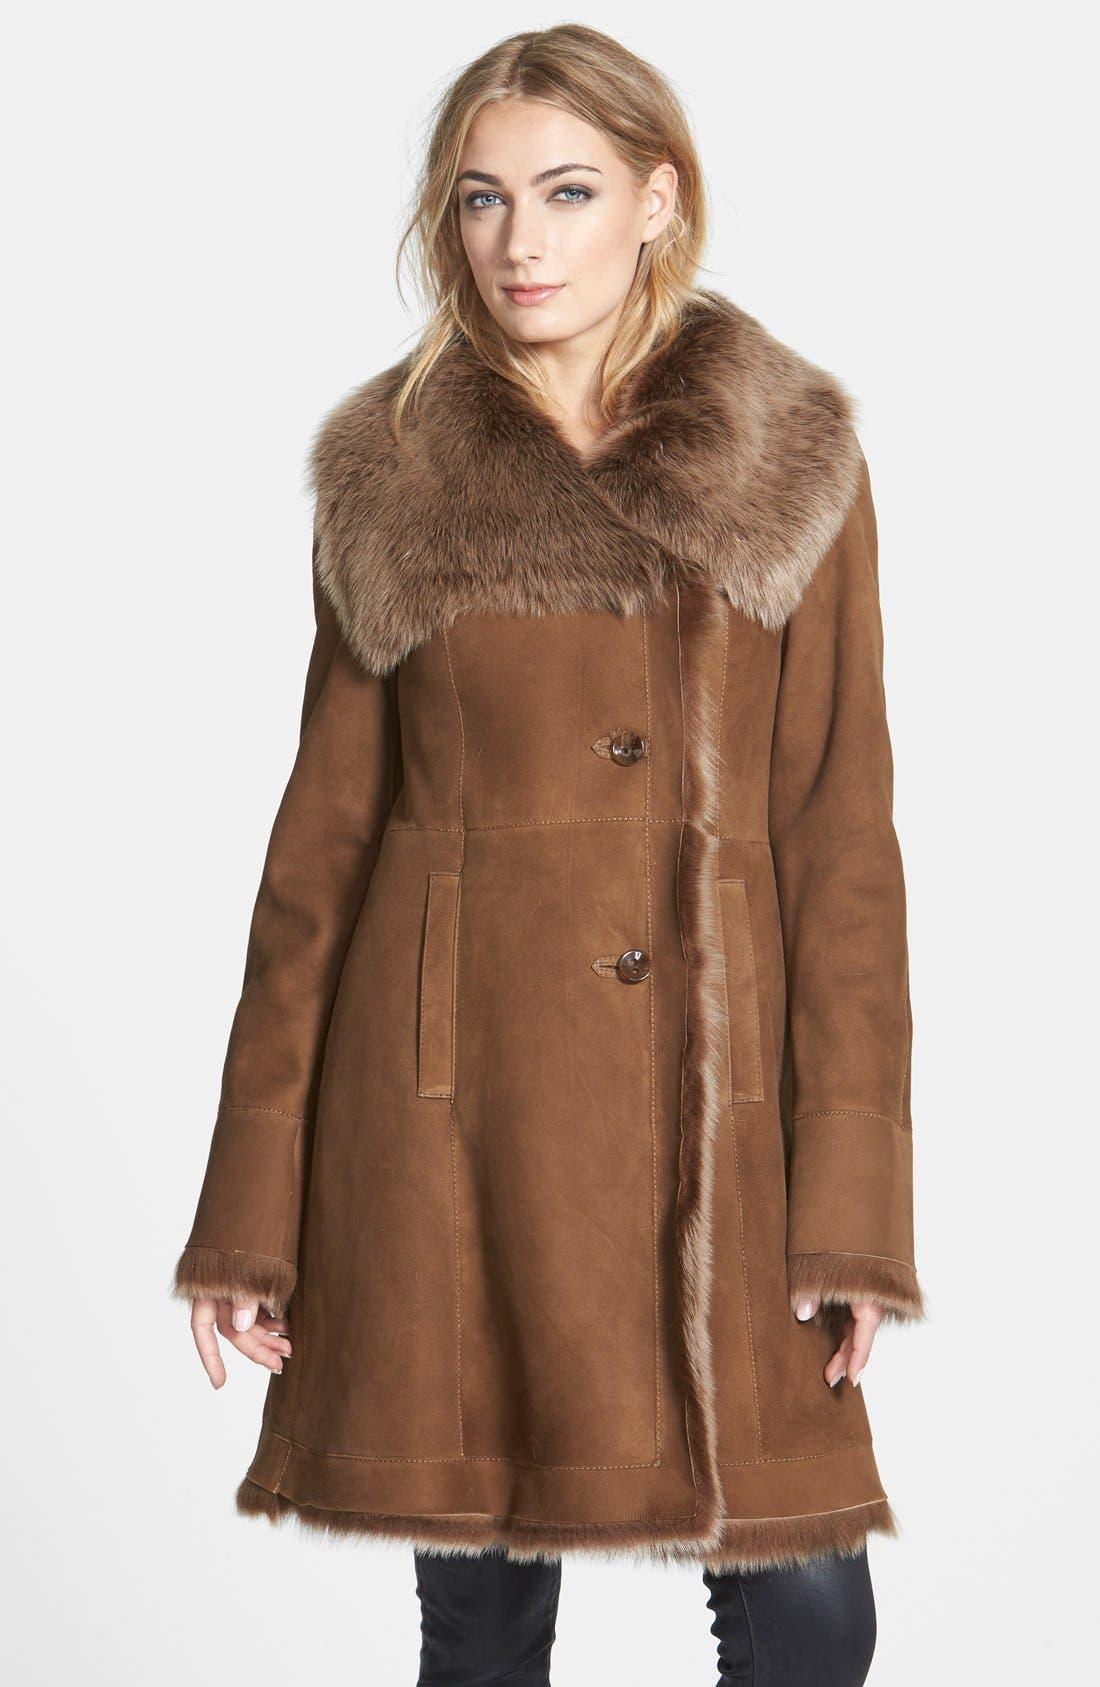 Alternate Image 1 Selected - HIDESOCIETY Envelope Collar Genuine Toscana Shearling Coat